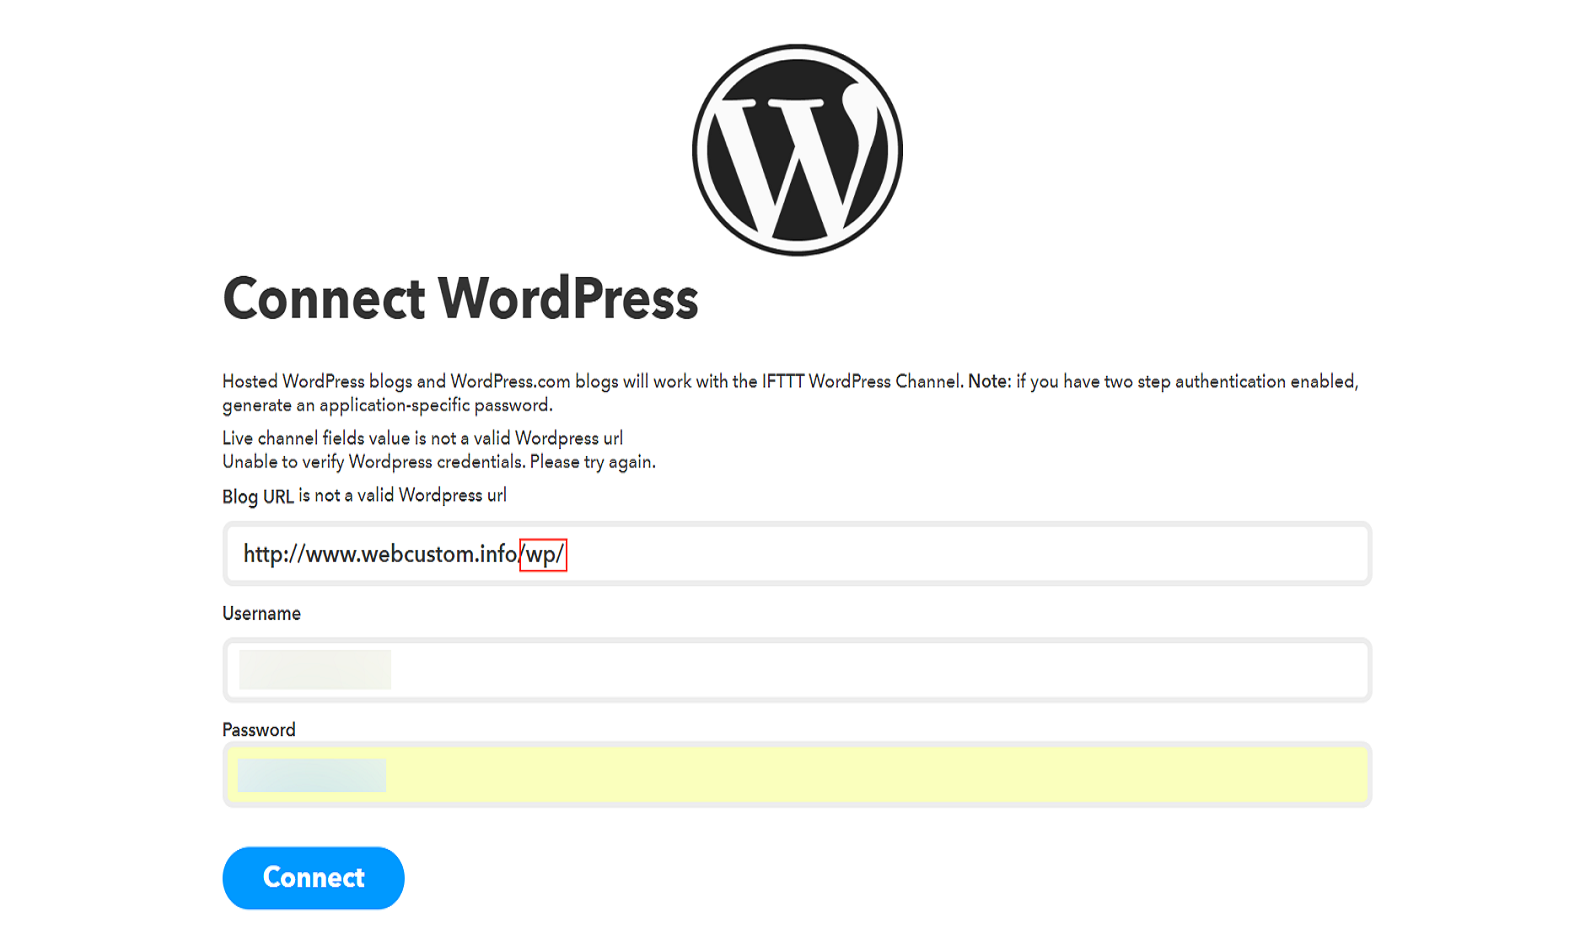 WordPressの連携方法